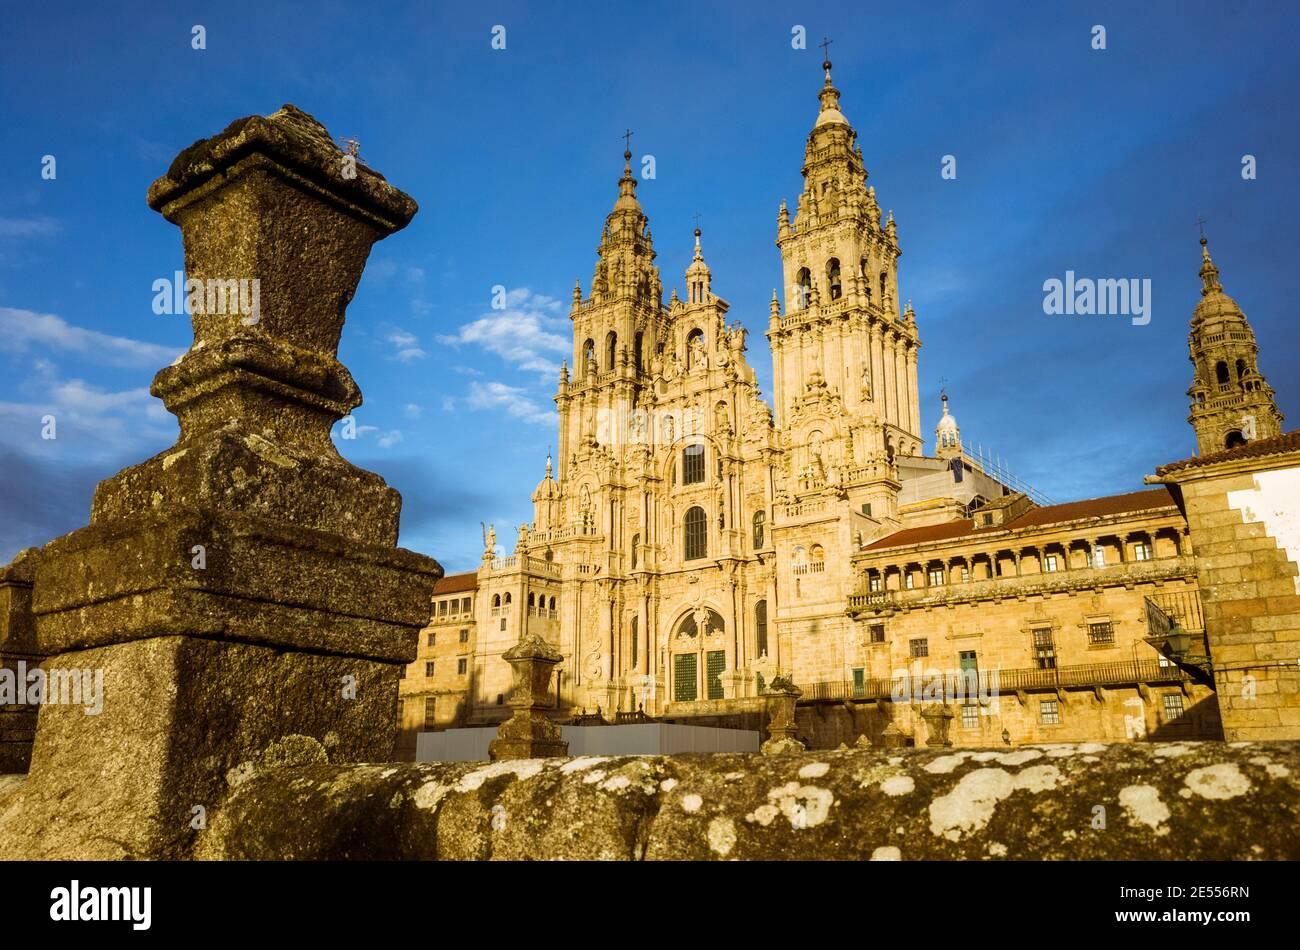 Santiago de Compostela, A Coruña province, Galicia, Spain - February 12th, 2020 : Baroque facade of the cathedral in the Obradoiro square. The Cathedr Stock Photo